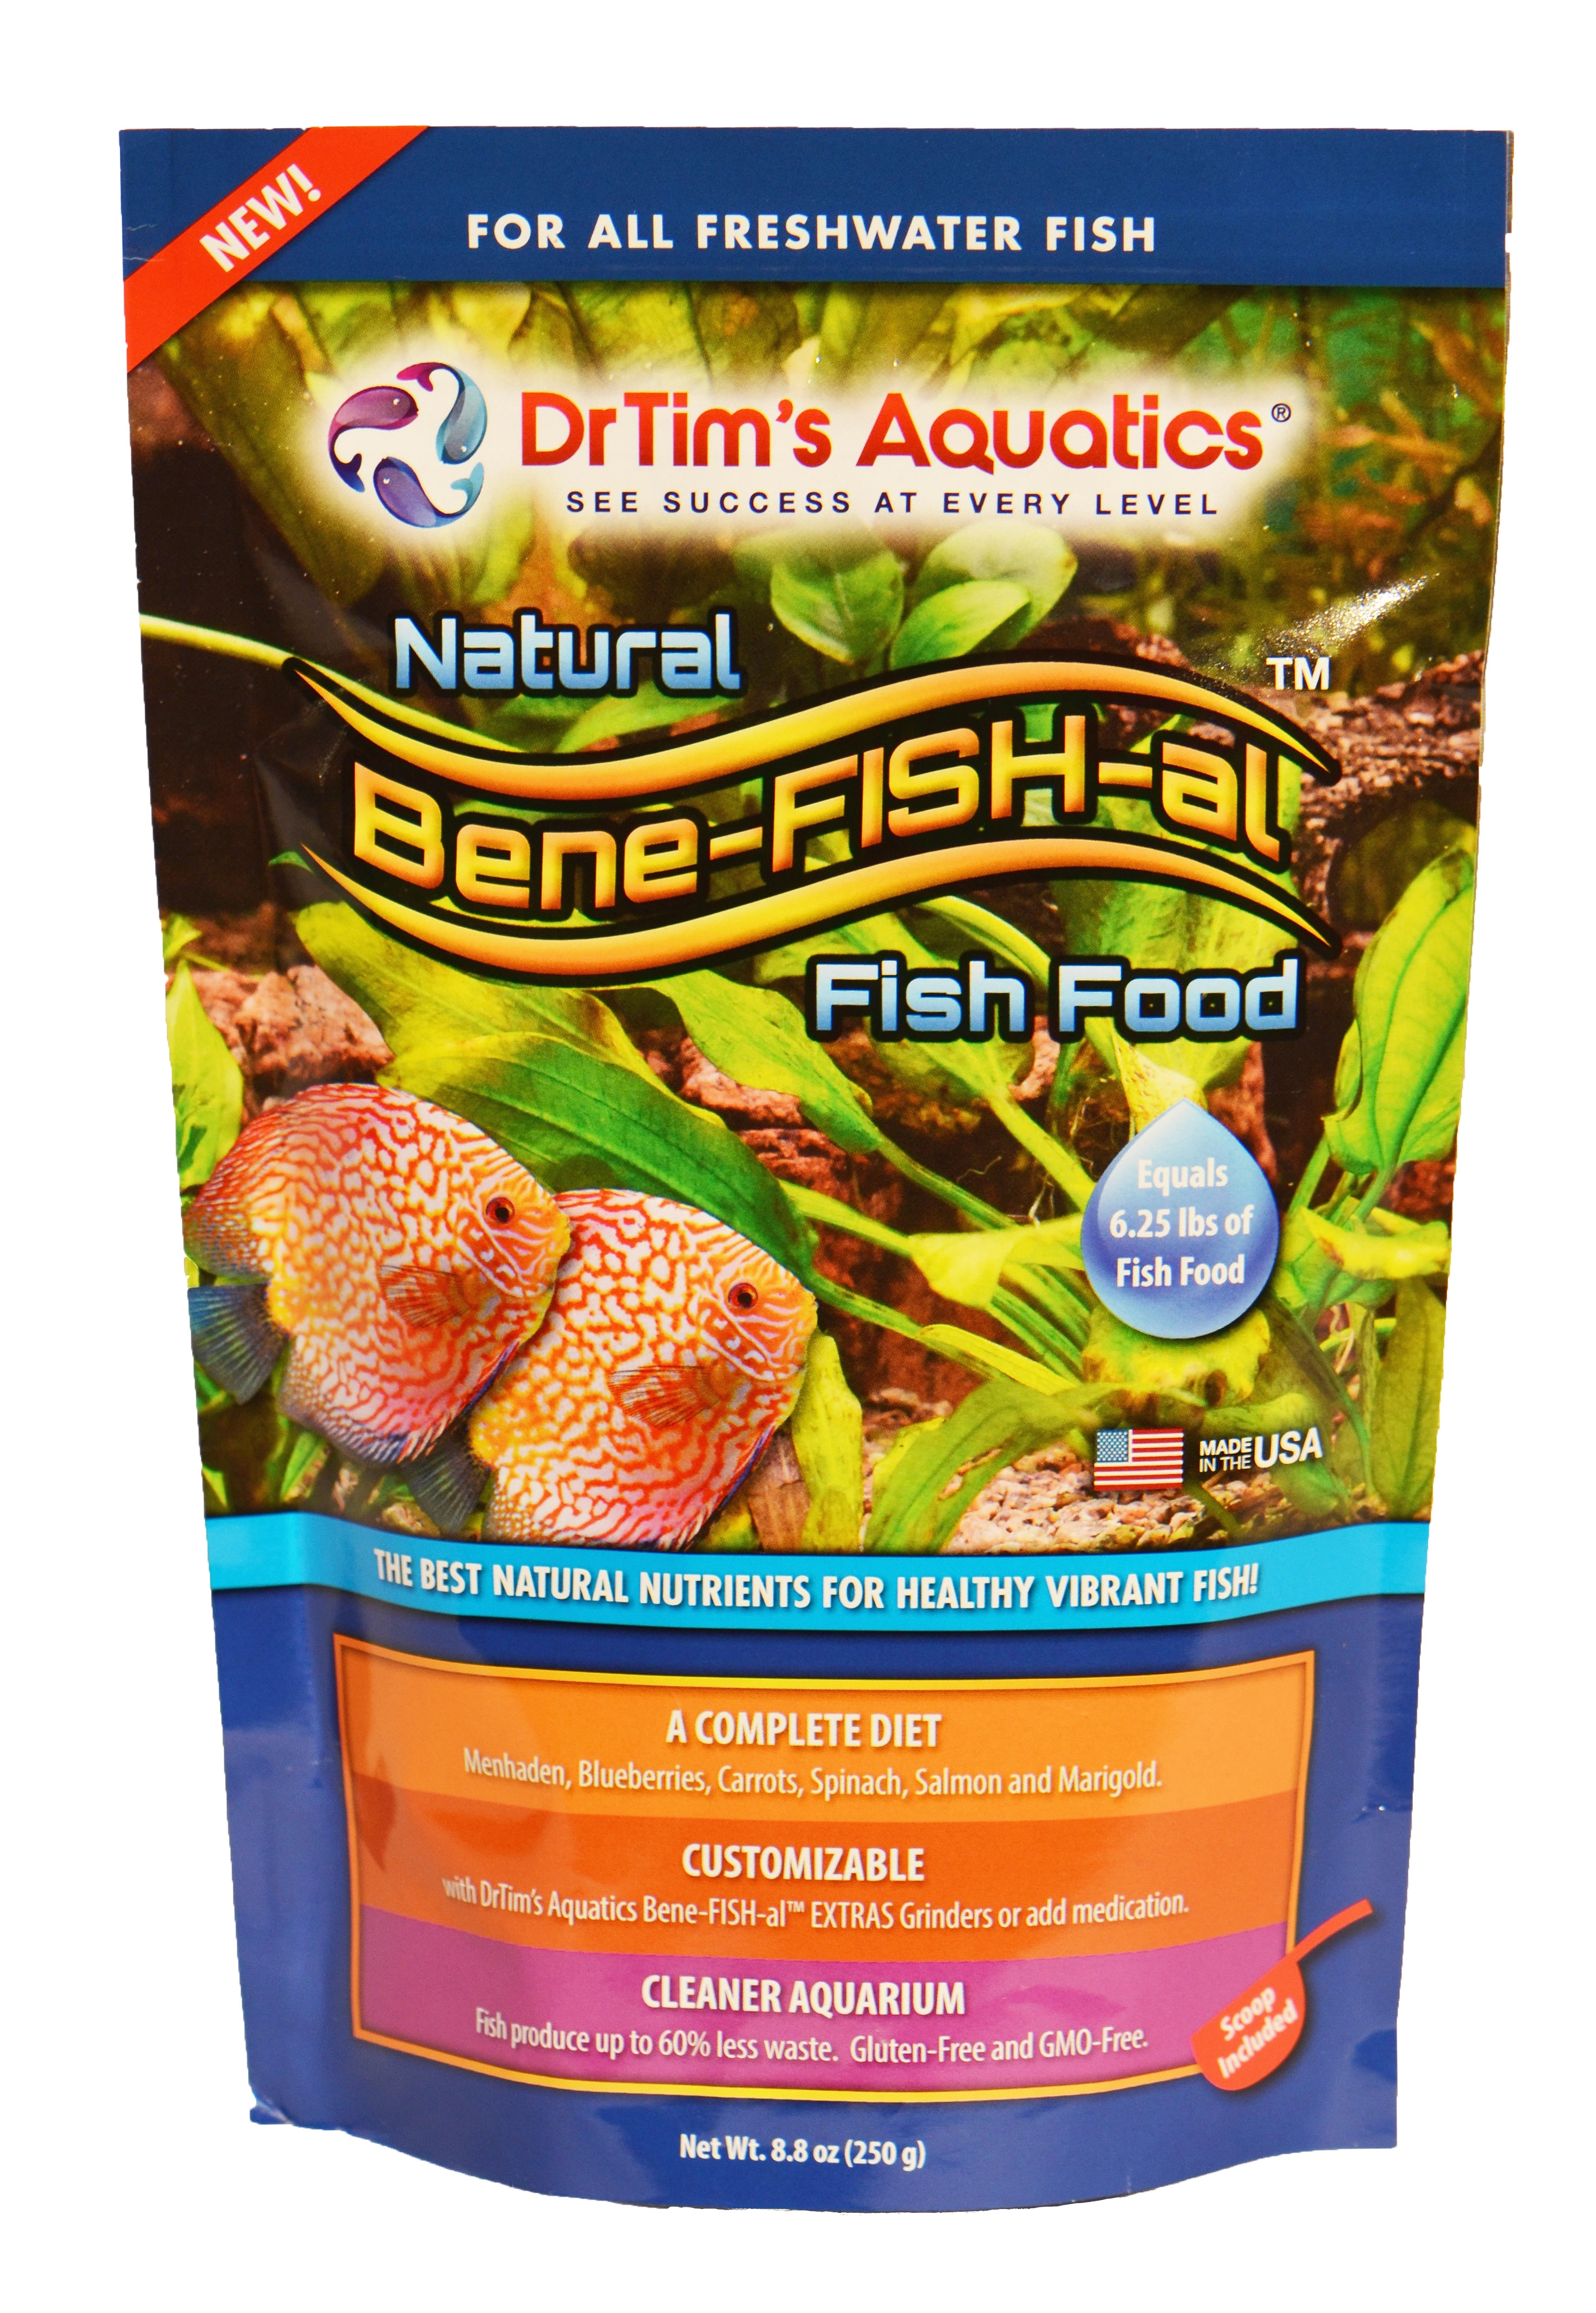 Bene fish al freshwater fish food economy pack for Freshwater fish food